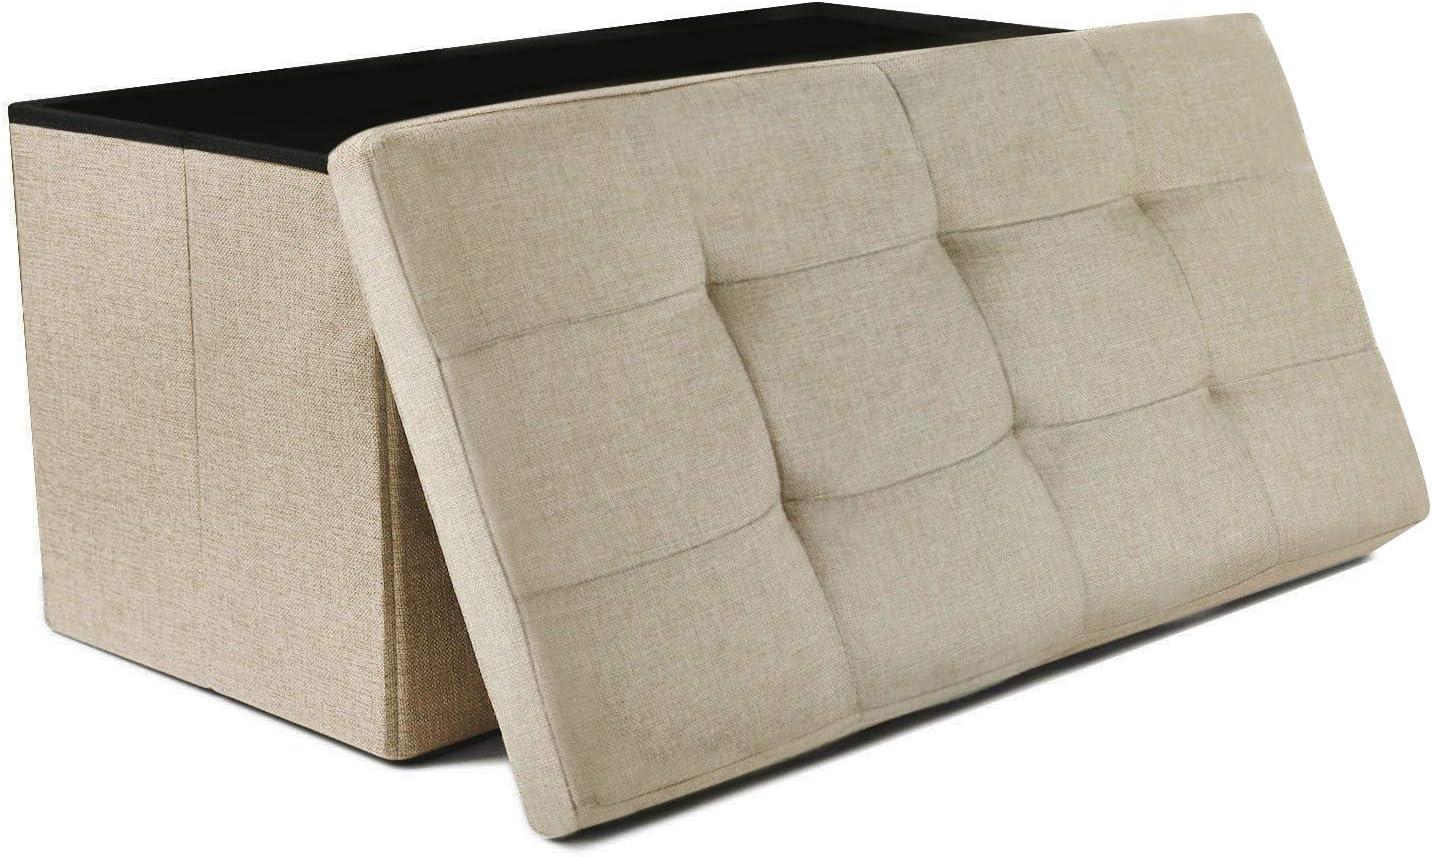 NISUNS OT03 30 Inch Linen Fabric Foldable Storage Bench Ottoman, Beige